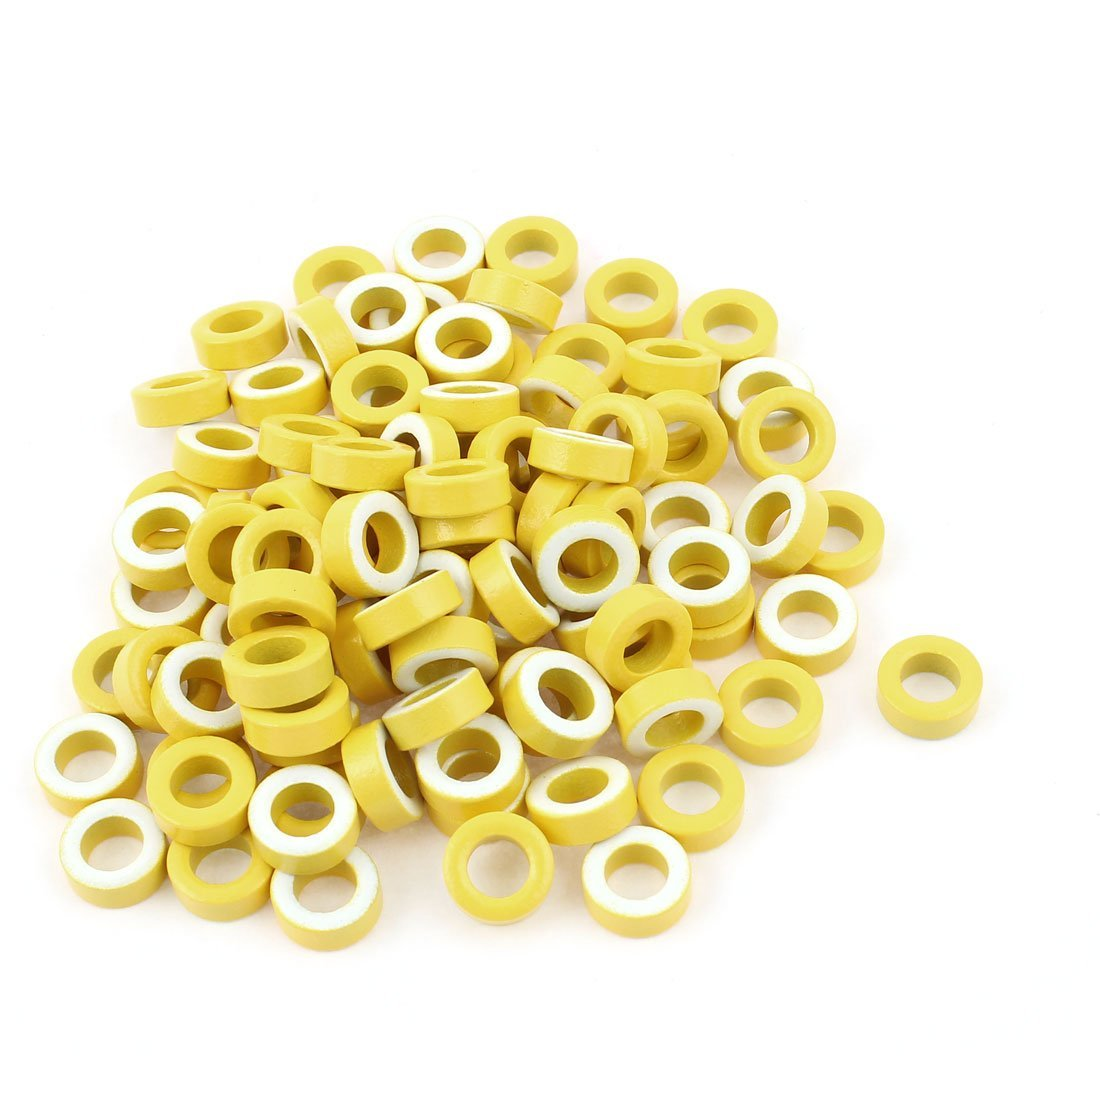 100 piezas de hierro DPTK5026 Poder núcleo toroidal de ferrita Anillos Blanco Amarillo